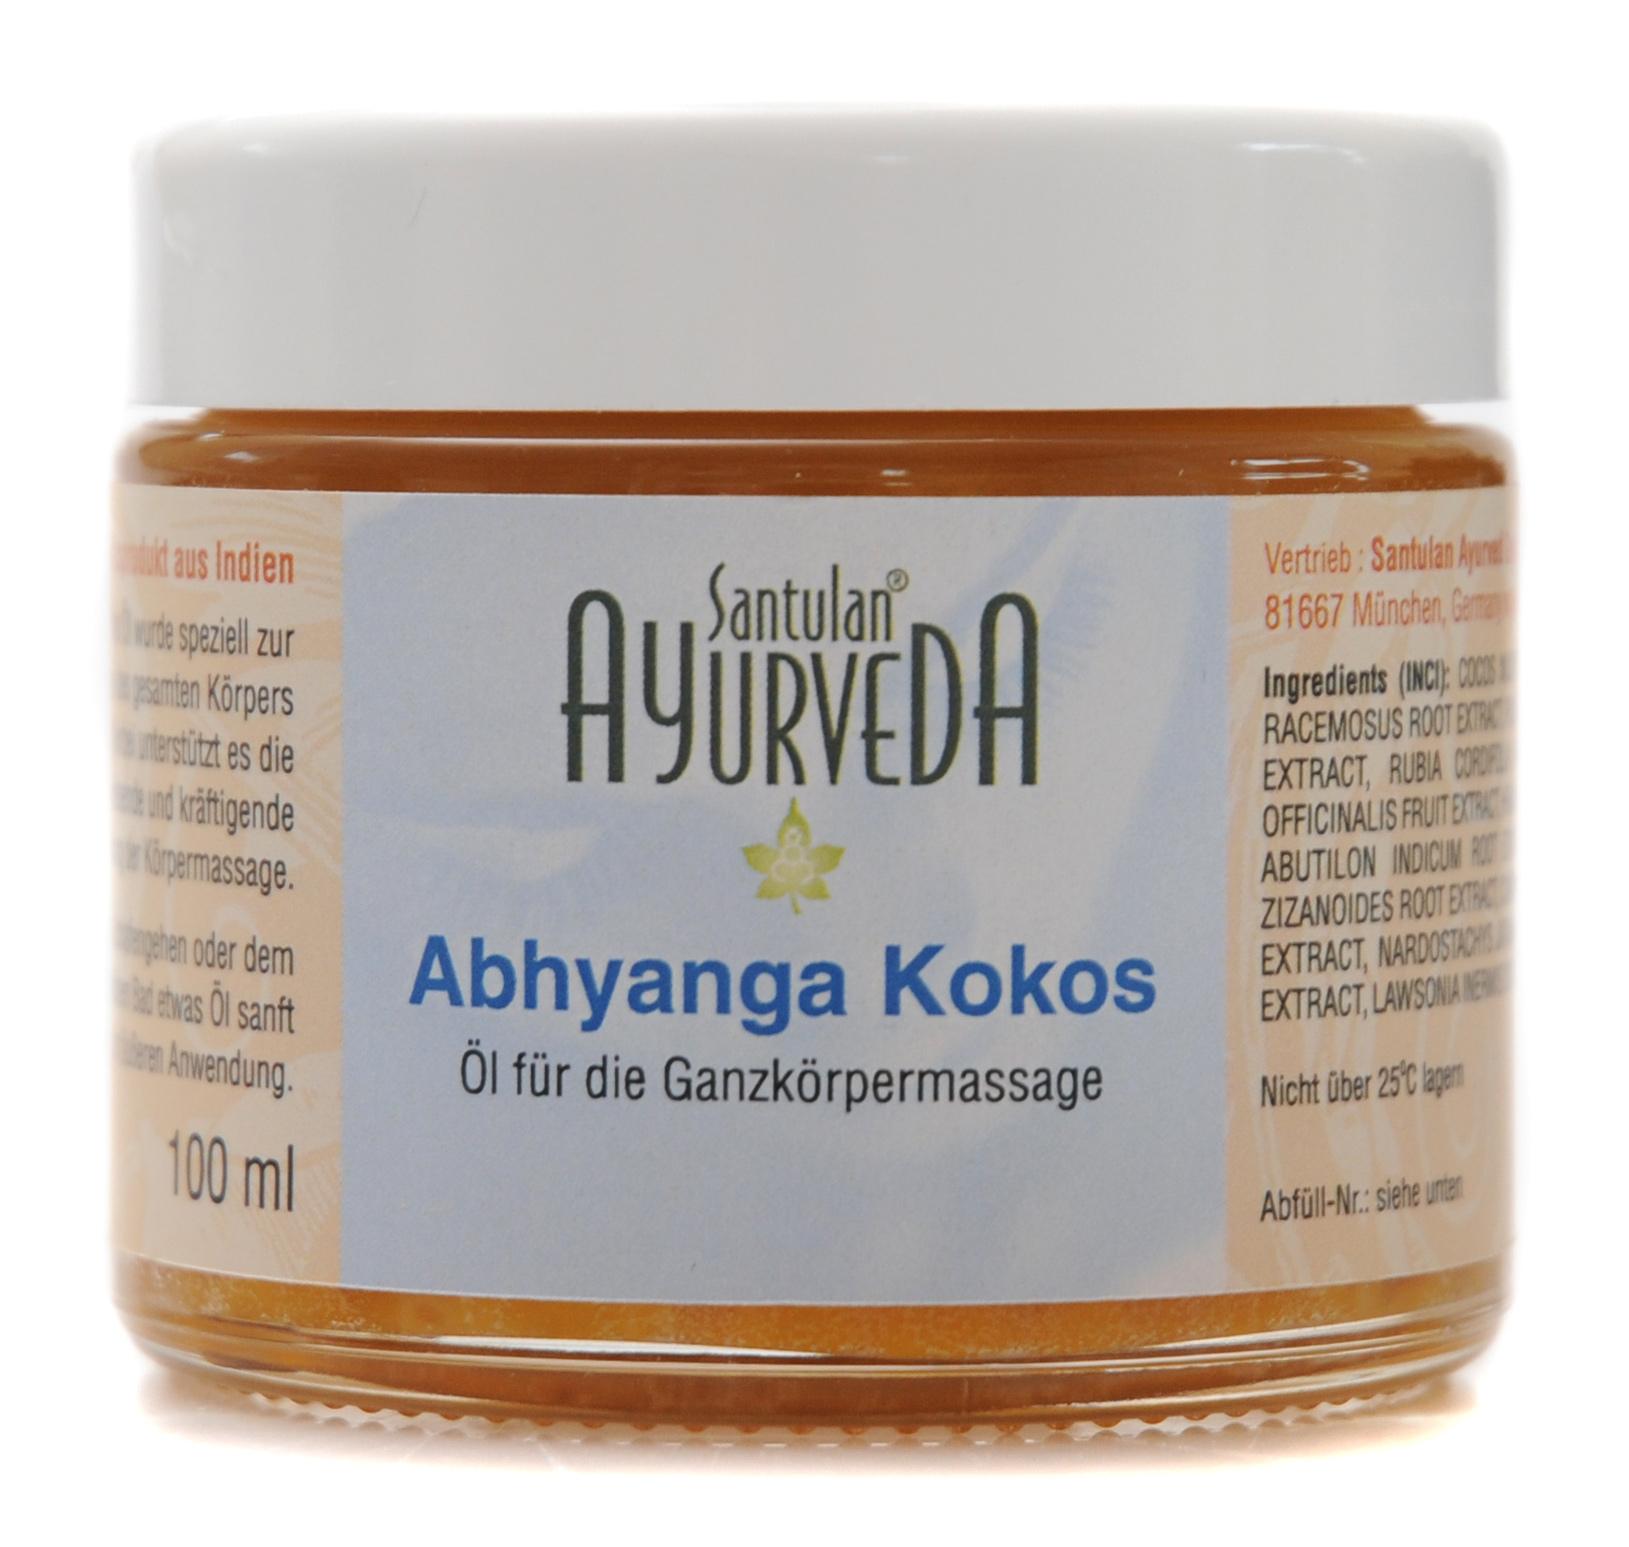 Abhyanga Kokosnussöl, 100 ml